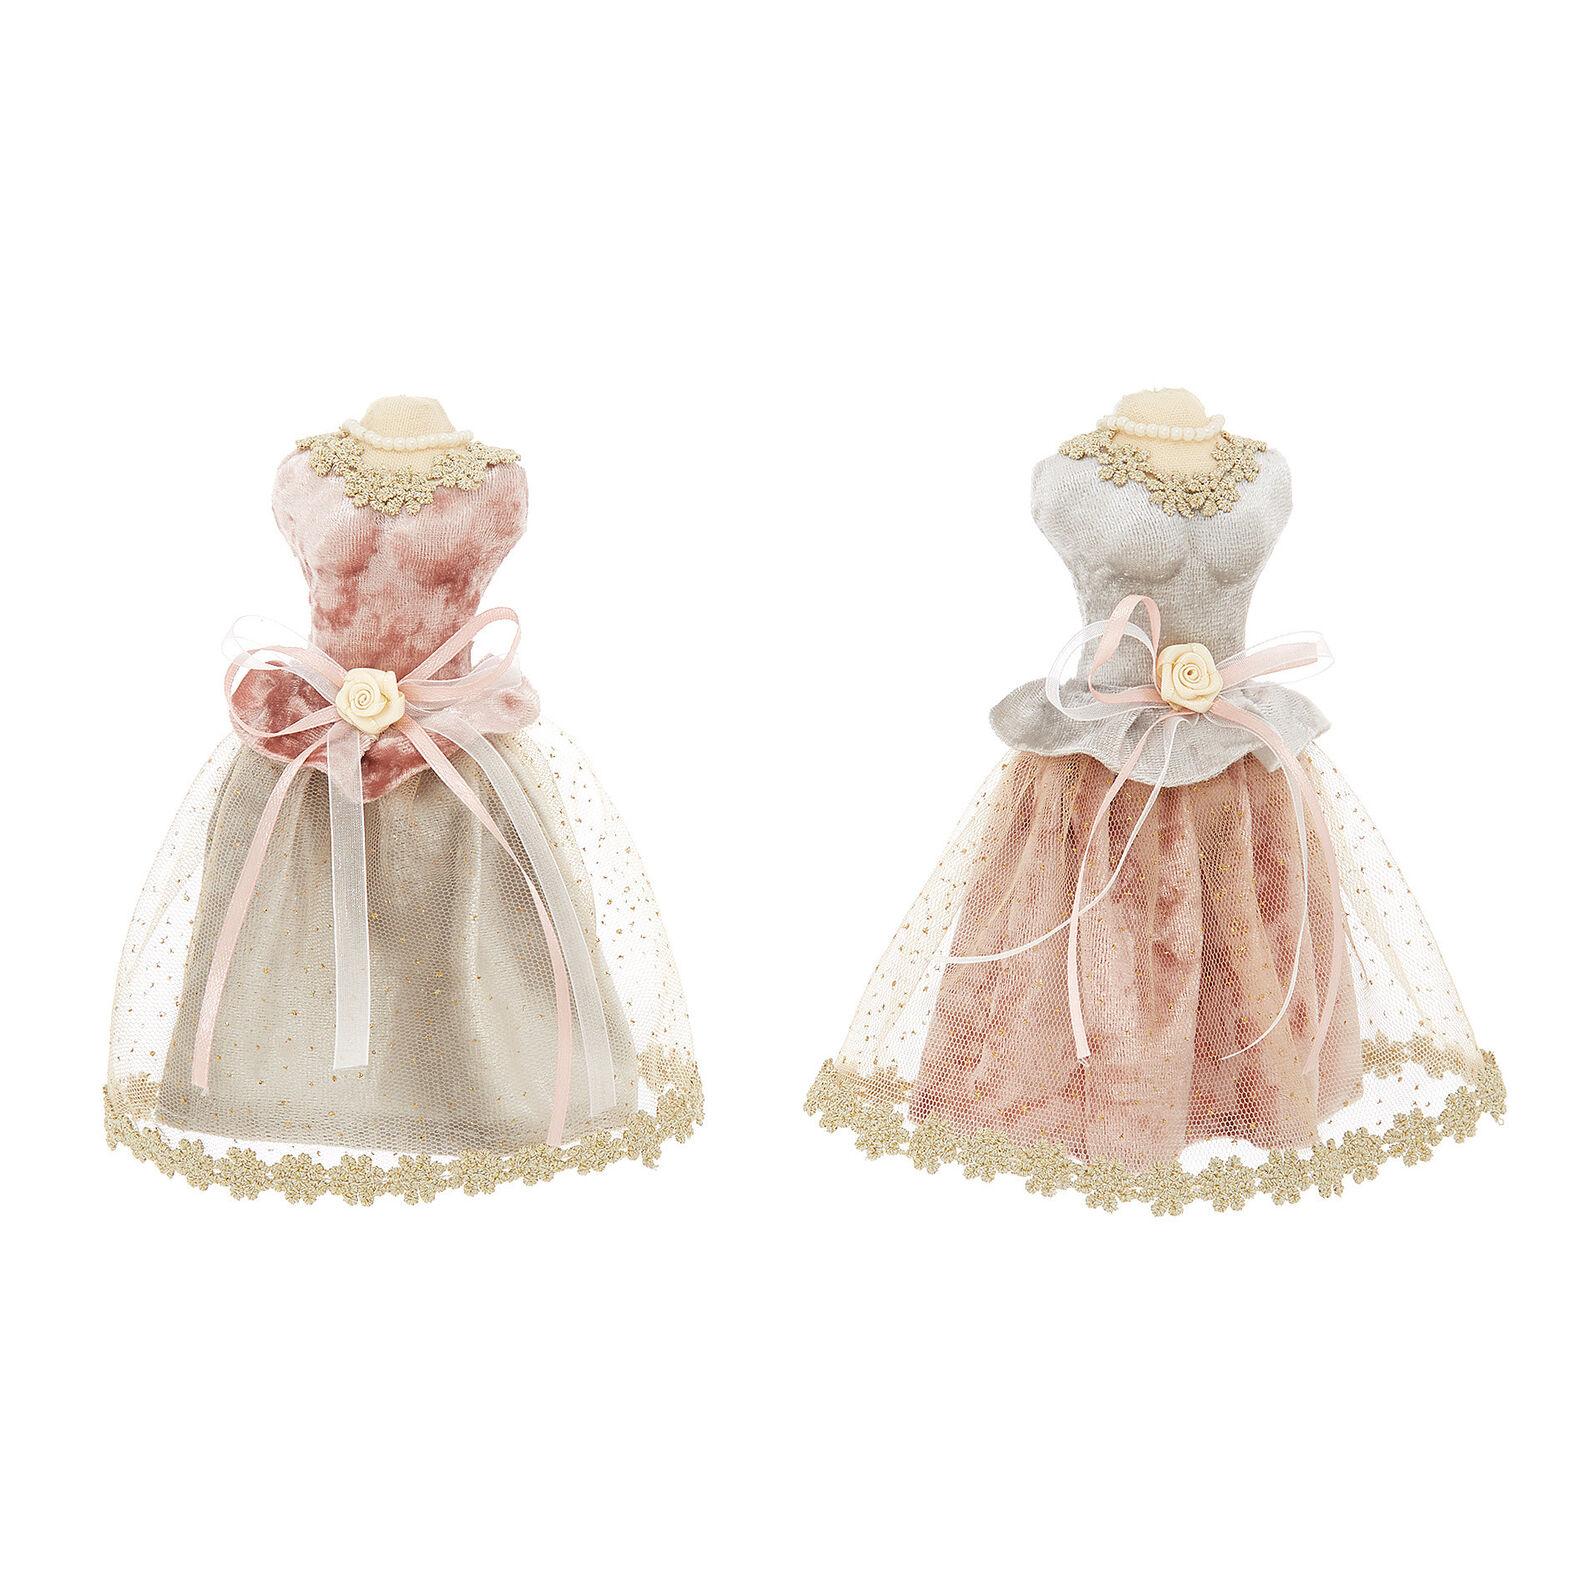 Ladys dress decoration in velvet